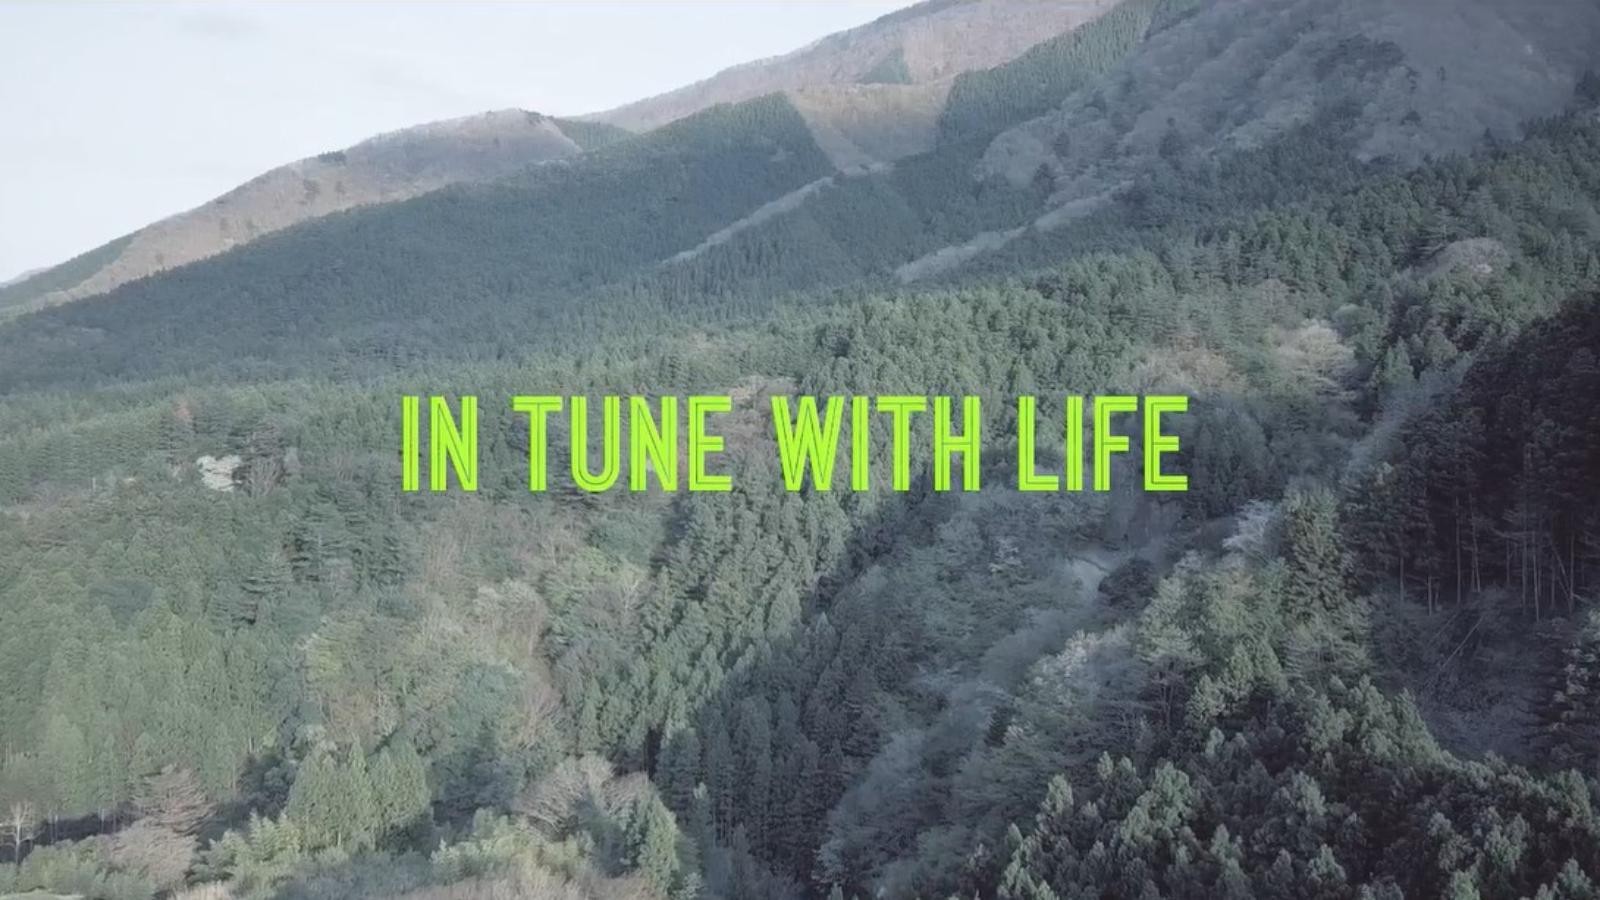 「In Tune with Life」クリエイターが登場するスペシャルムービー公開(後編)